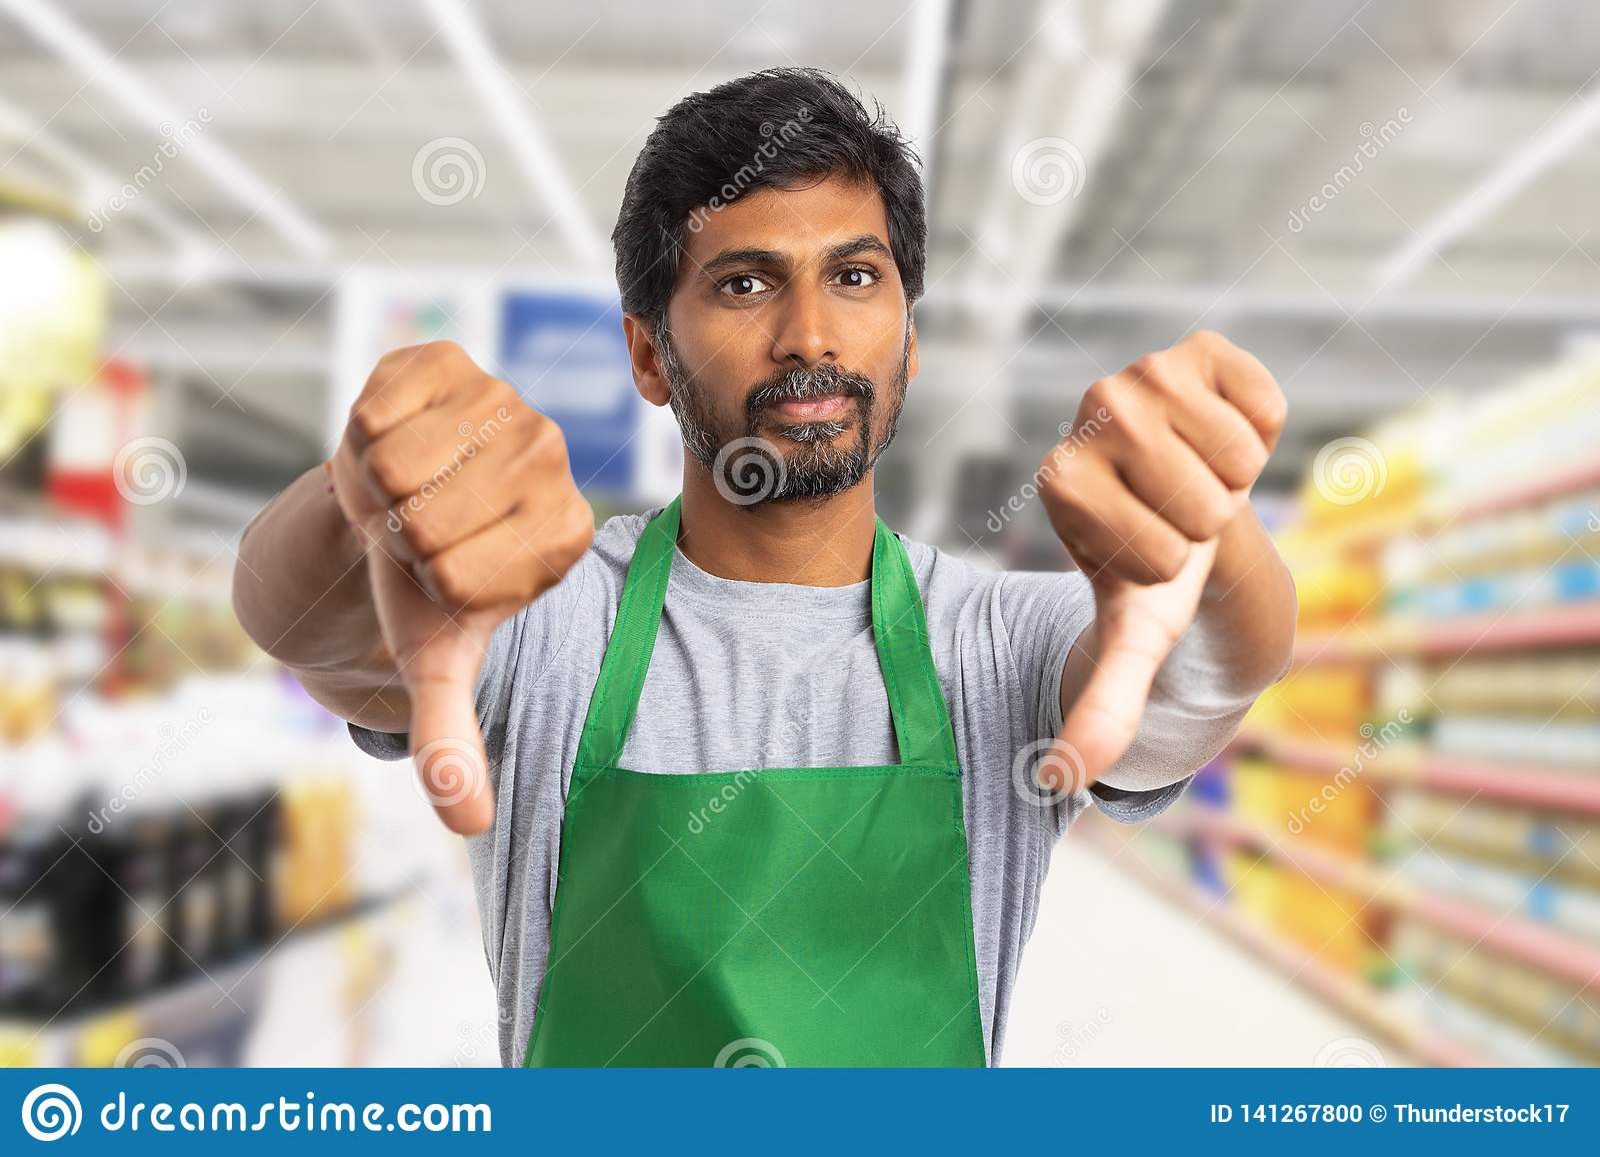 Supermarket worker making double thumbs-down gesture